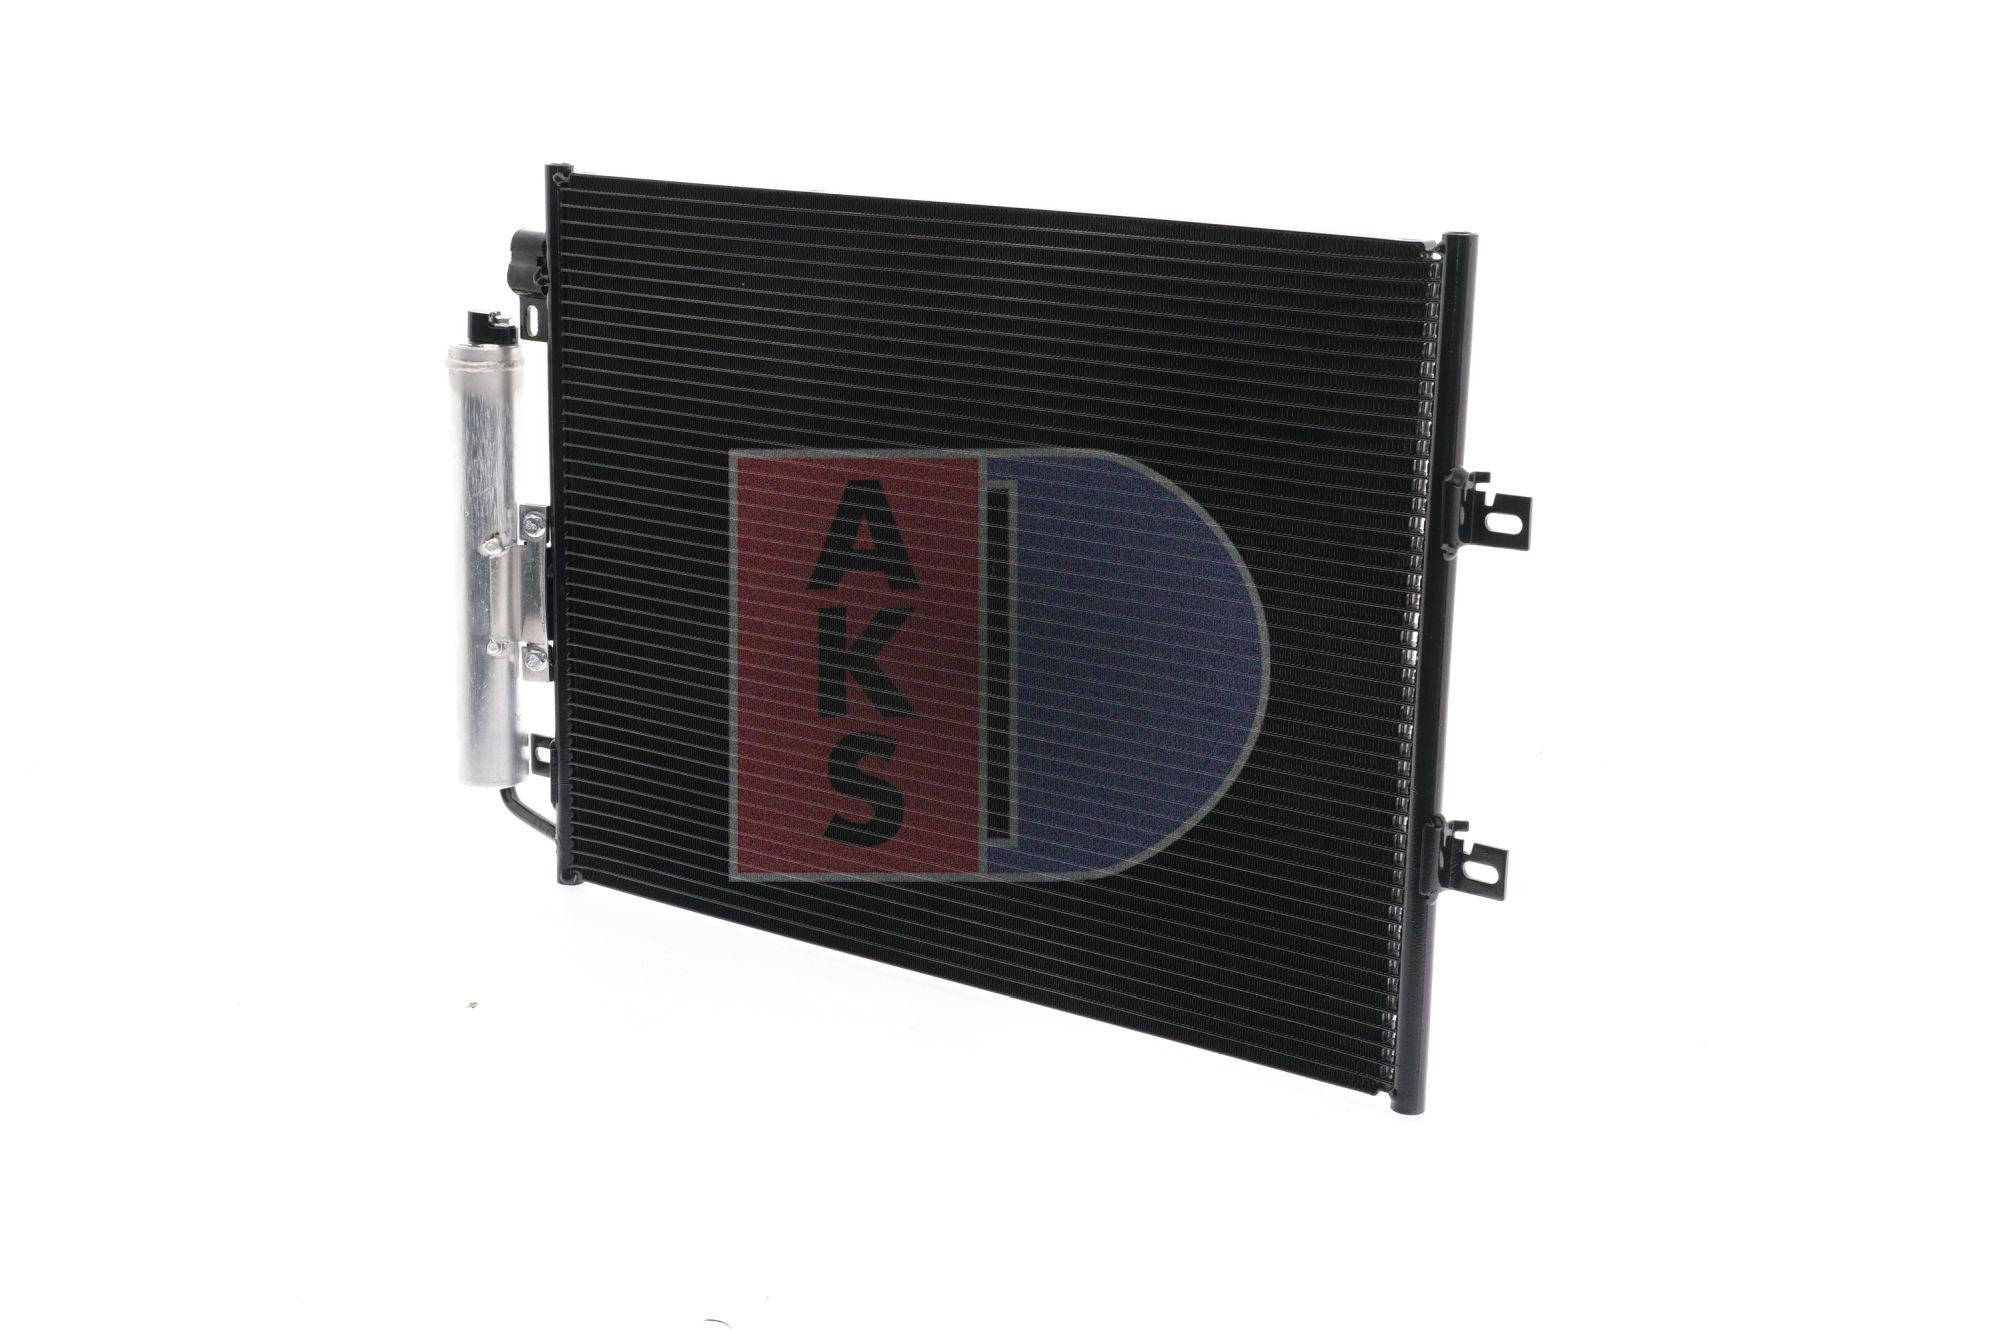 RENAULT TWINGO 2020 Klimakühler - Original AKS DASIS 182043N Netzmaße: 510x398x12